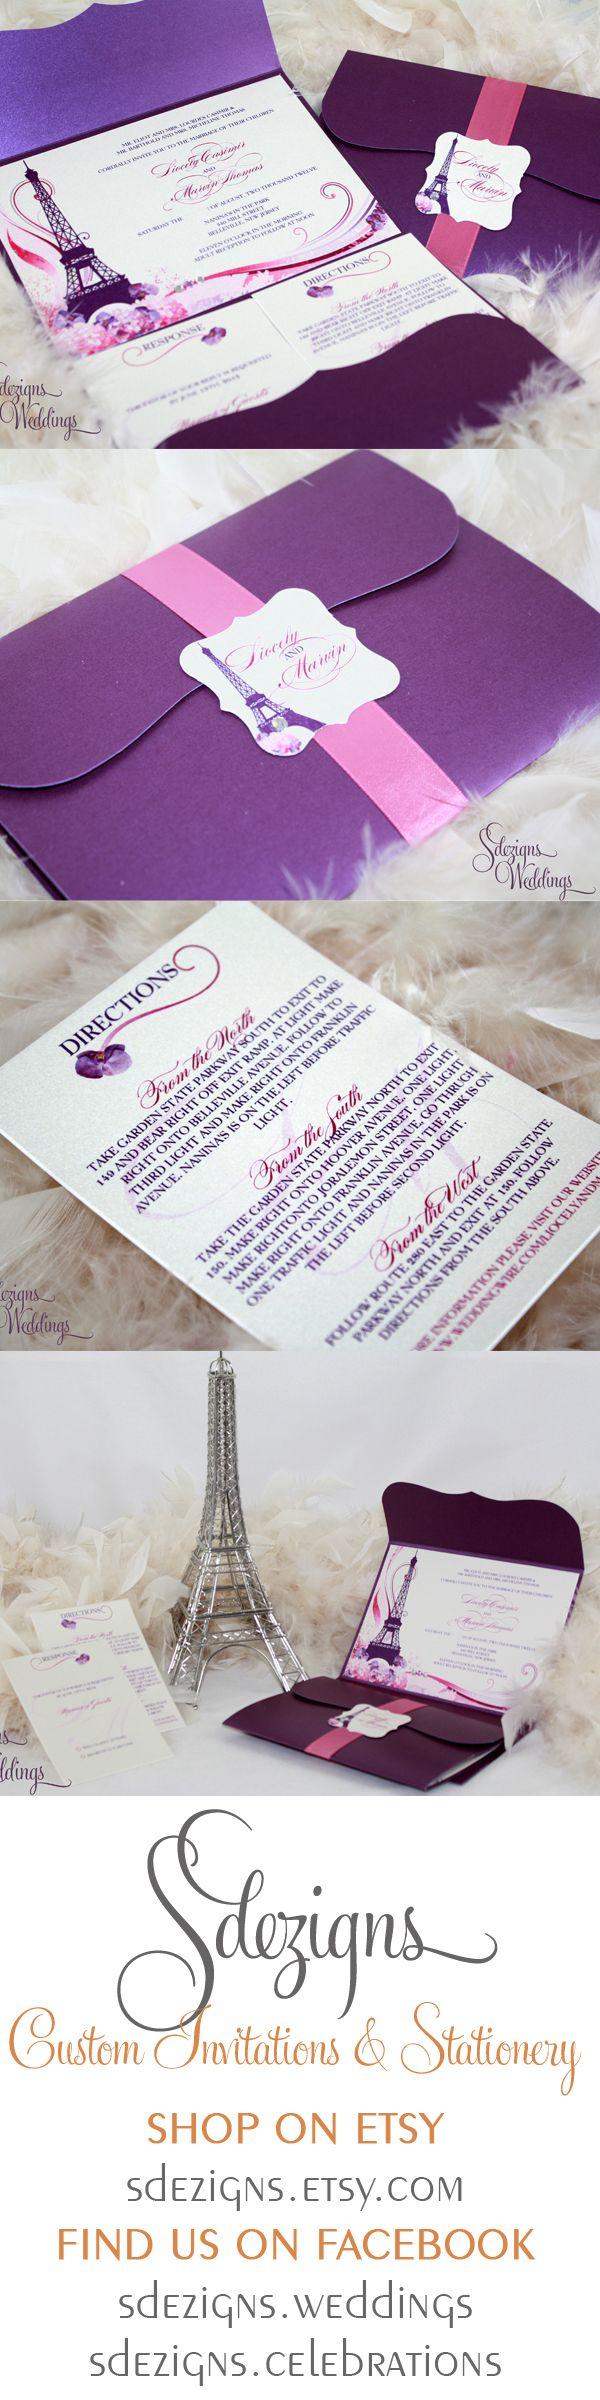 Purple hydrangea wedding invitation sample - Gorgeous Paris Wedding Invitations